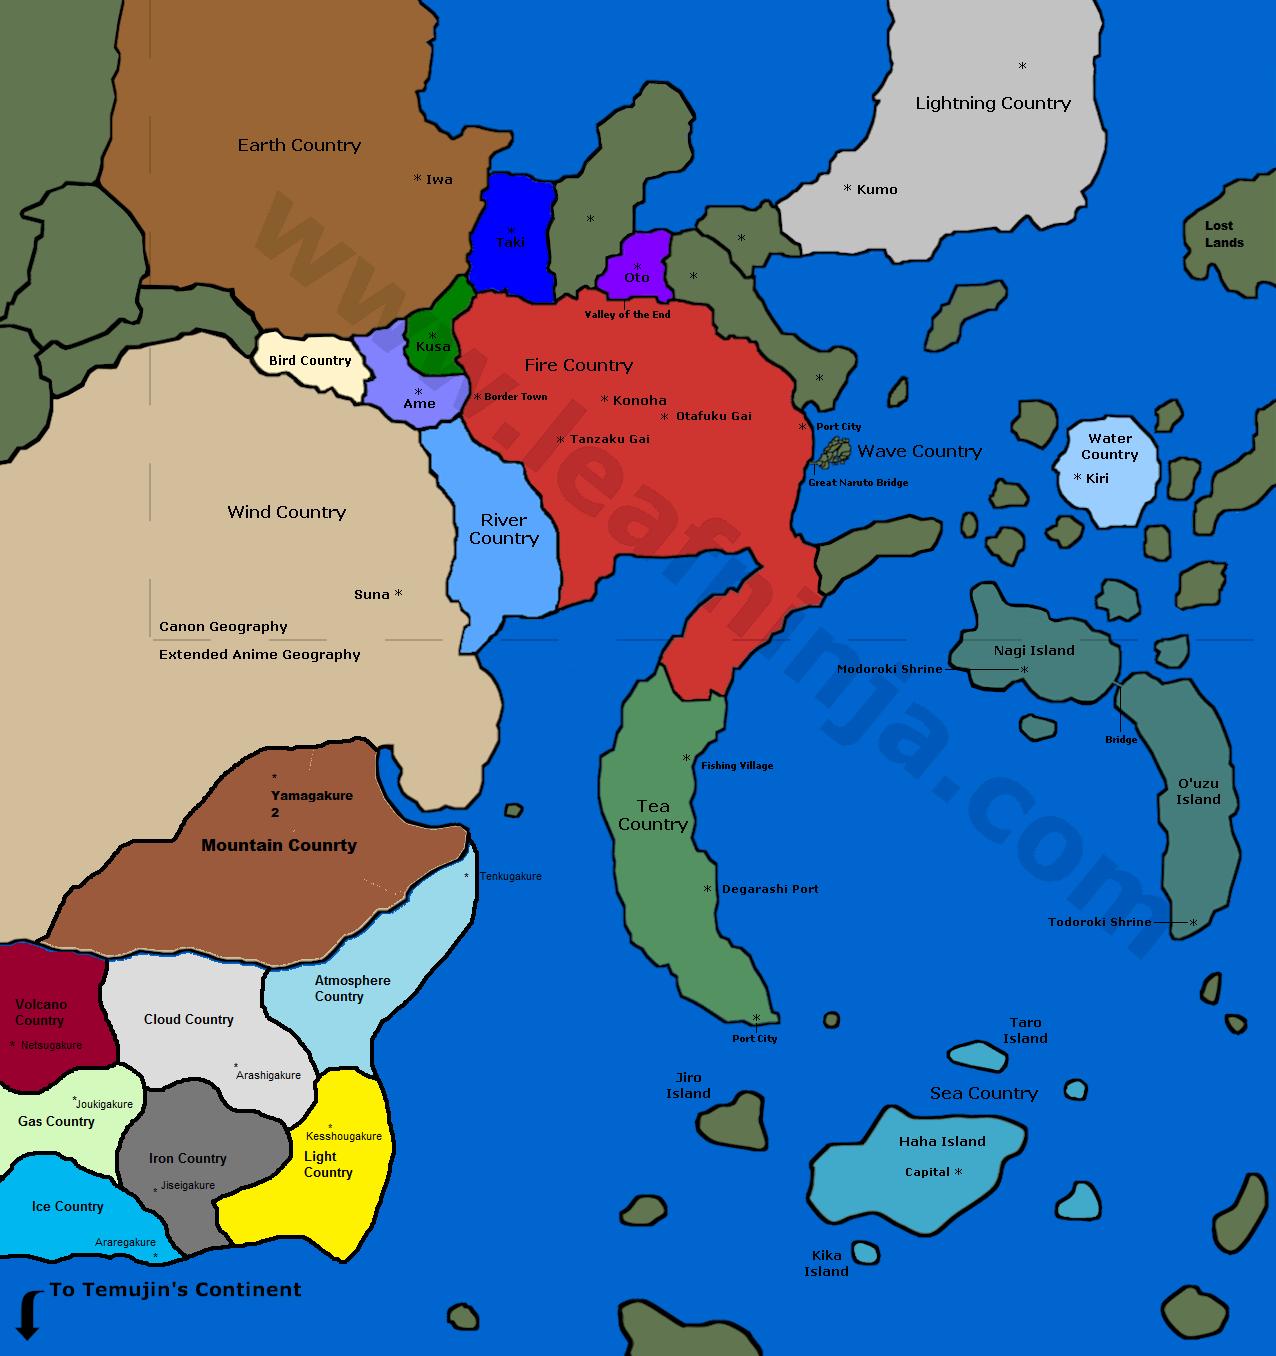 Image world map version 4g dragon ball af fanon wiki fandom world map version 4g gumiabroncs Gallery